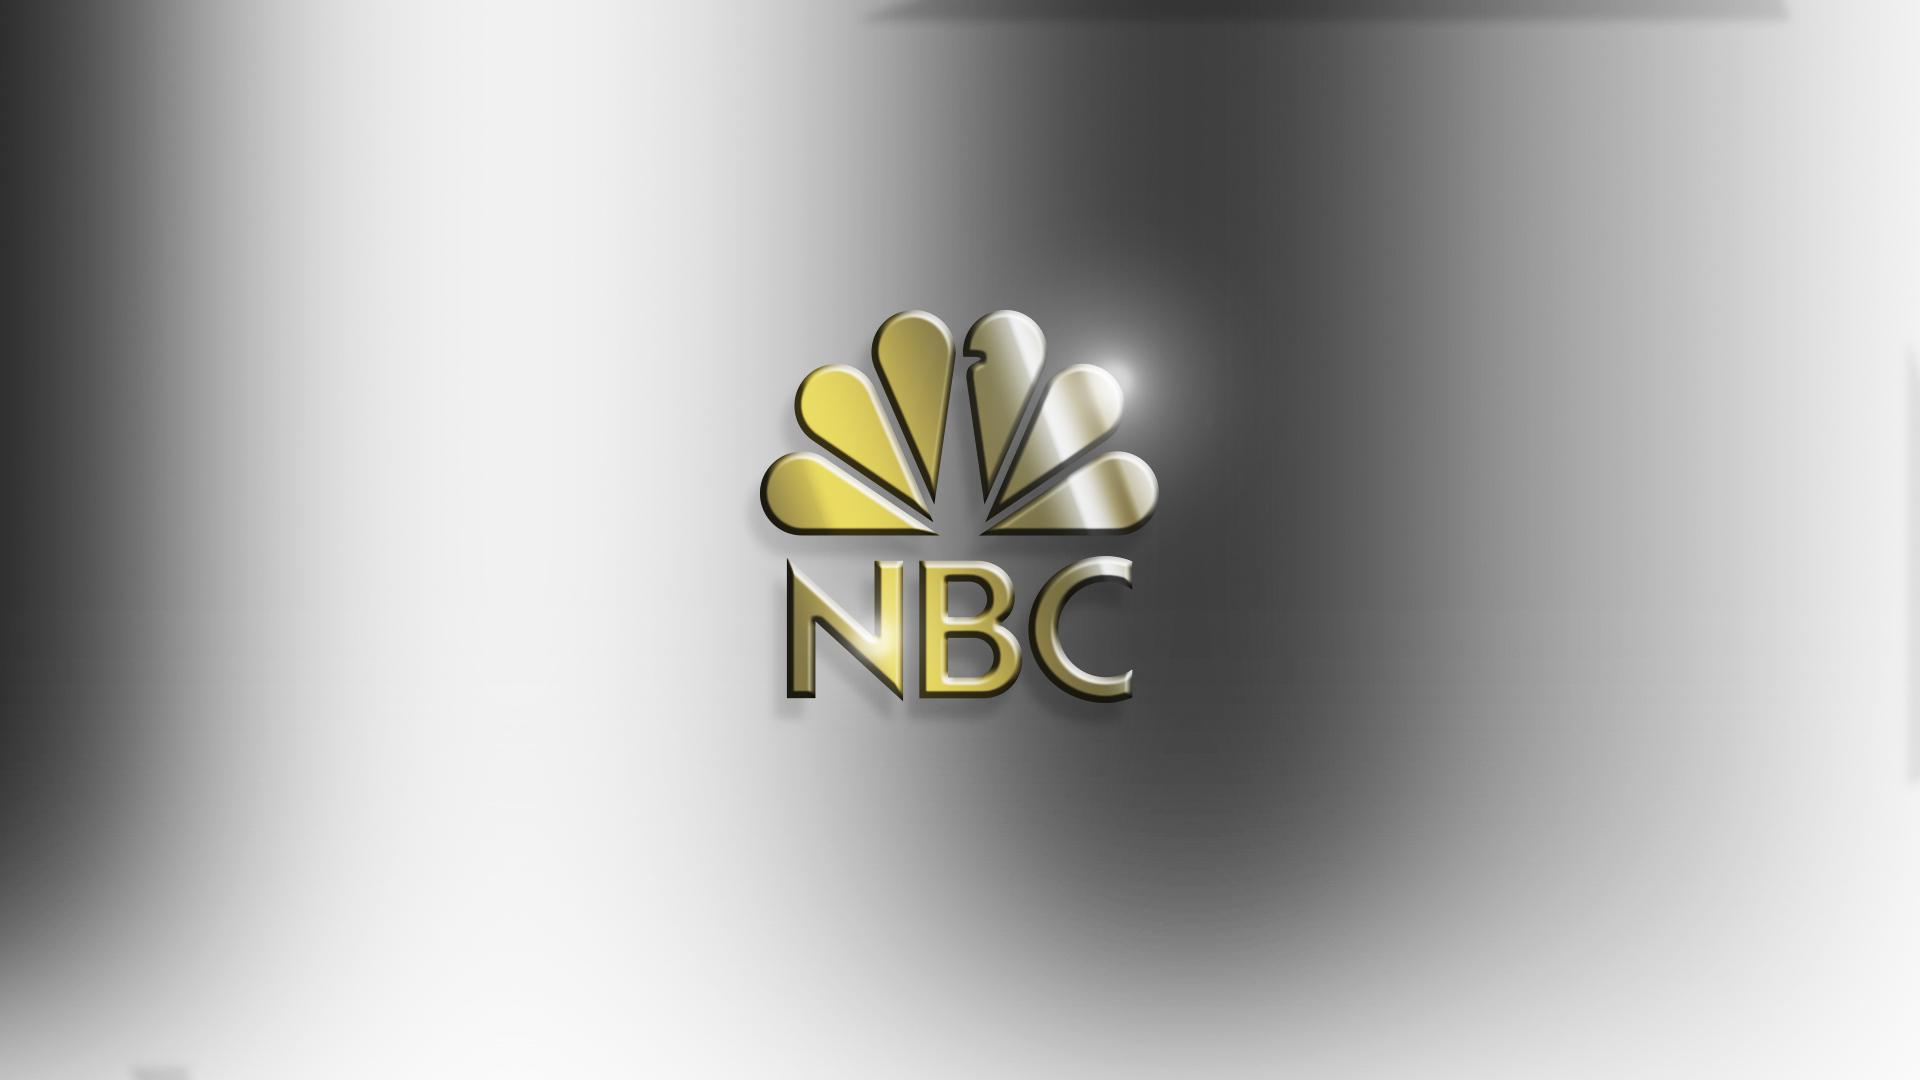 NBCLOGO11.jpg